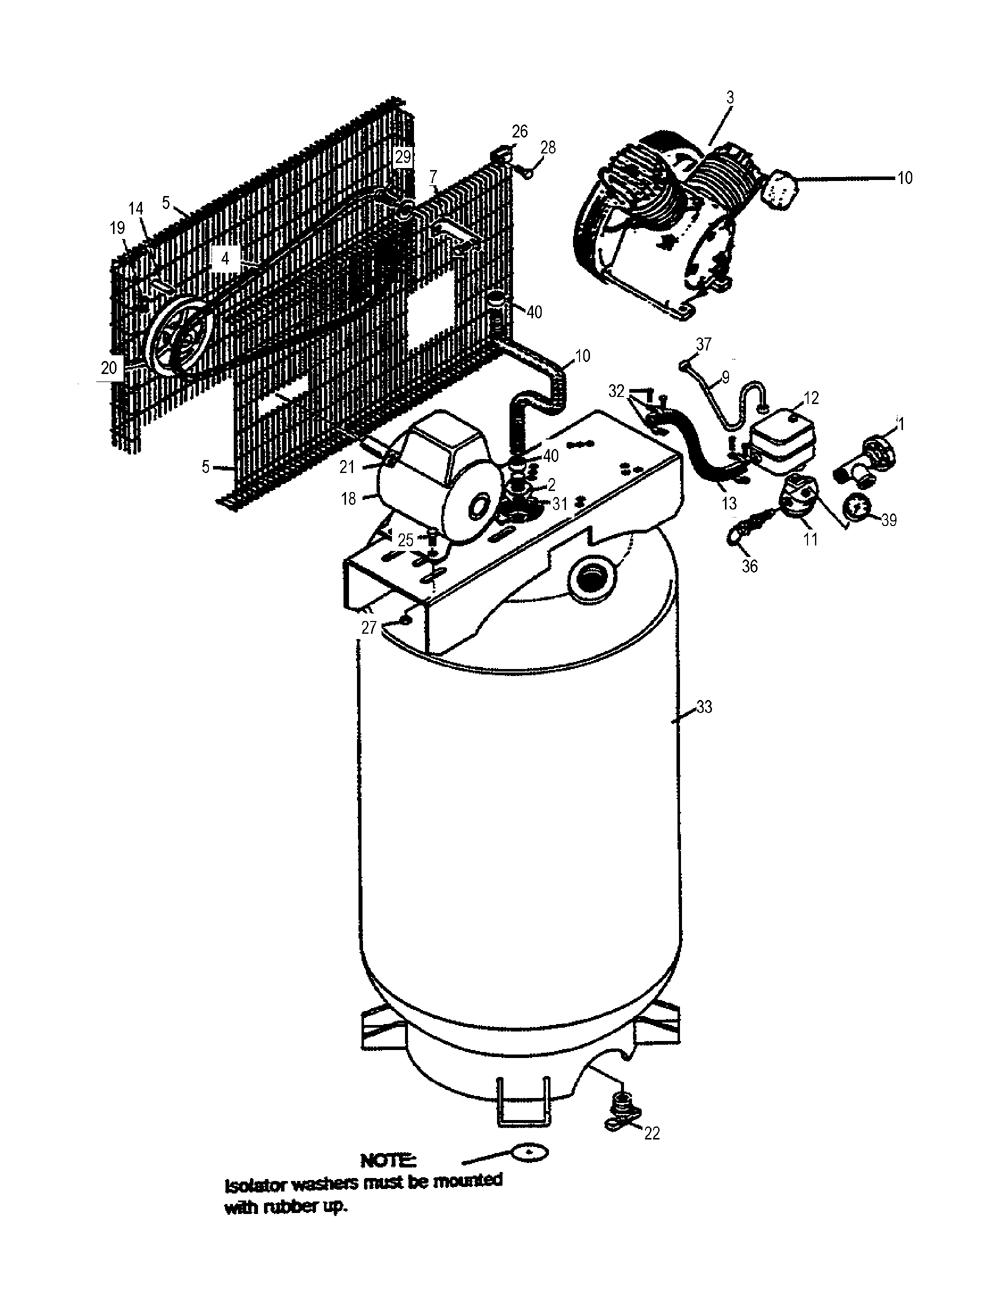 LS6580V2M-Devilbiss-T0-PB-1Break Down